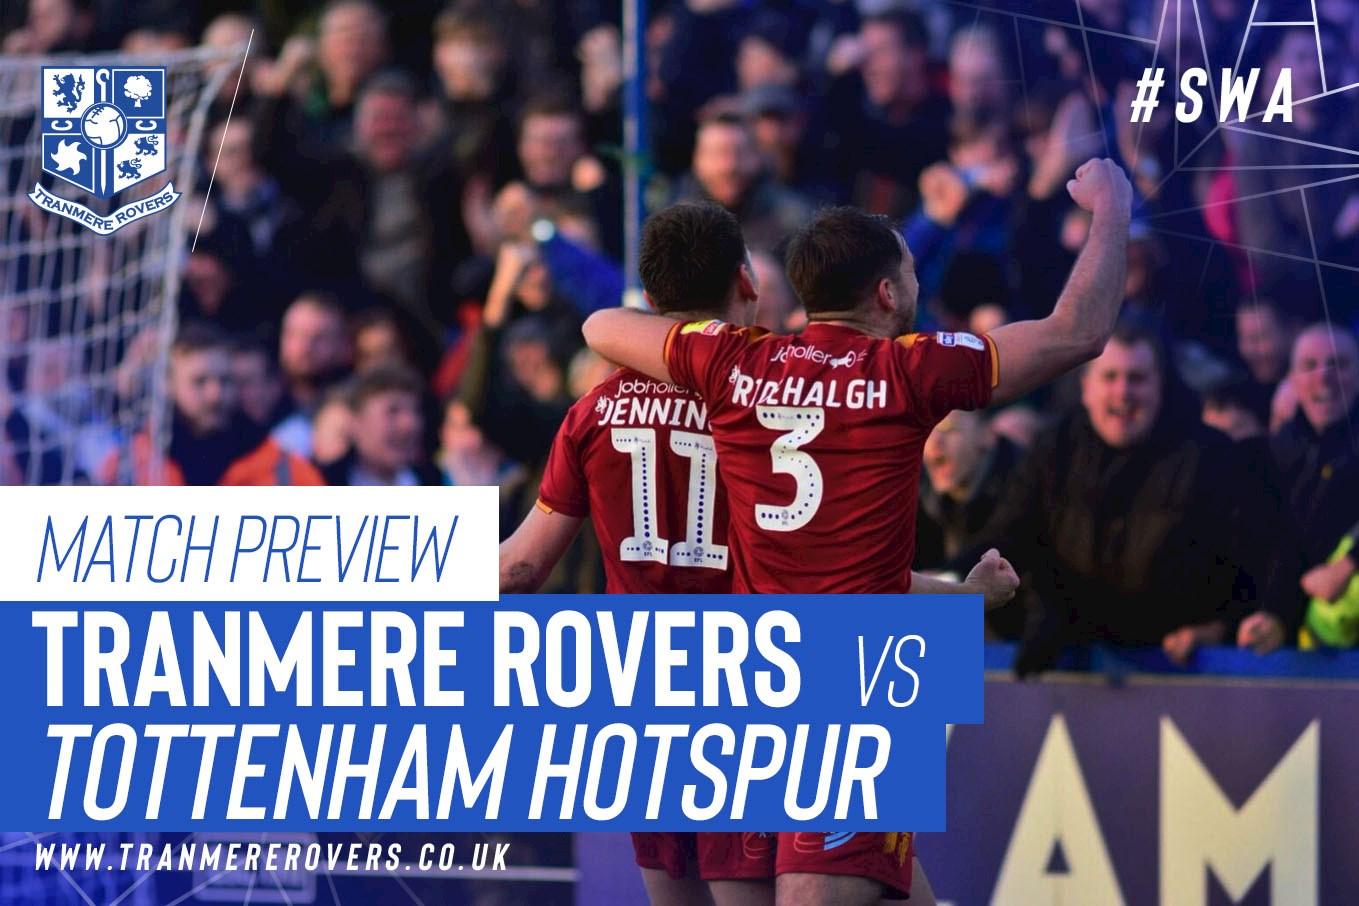 44e7a01d6c2 Preview  Tottenham Hotspur - News - Tranmere Rovers Football Club